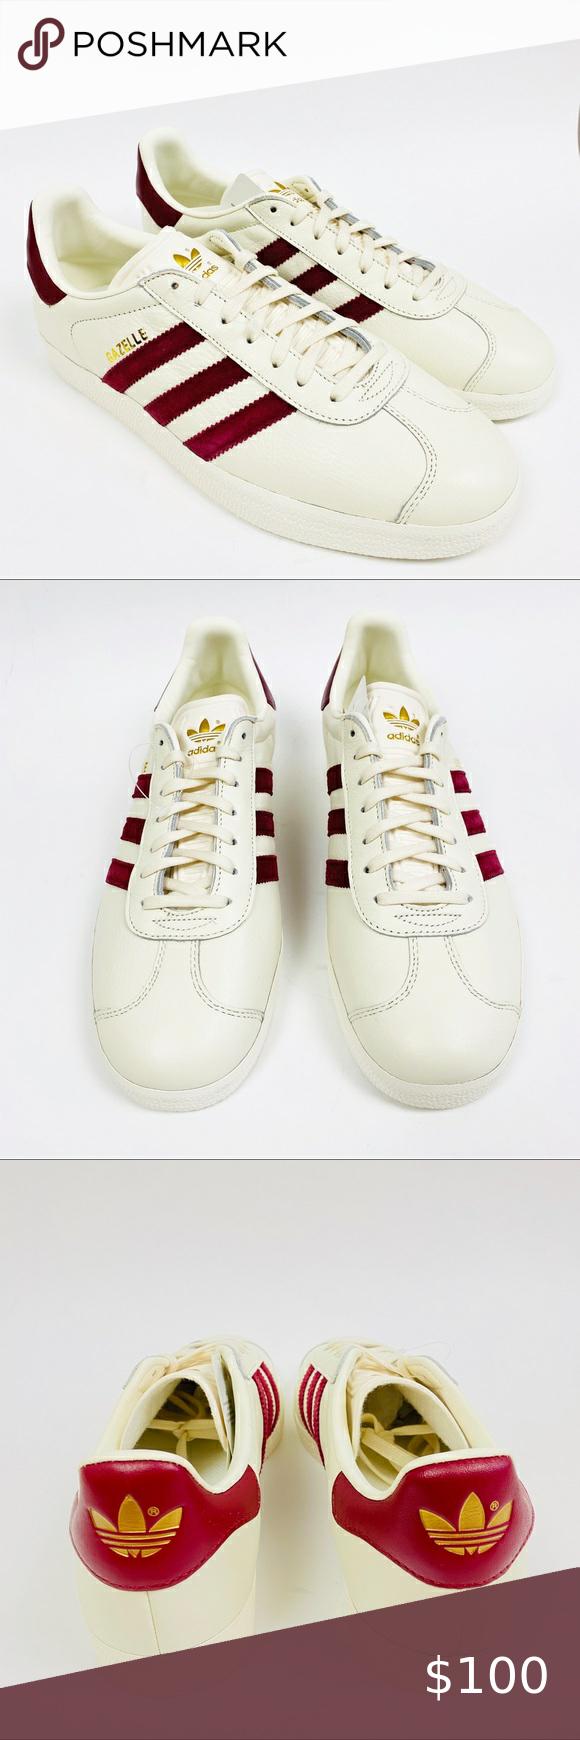 Adidas Originals Gazelle Men's Sneakers